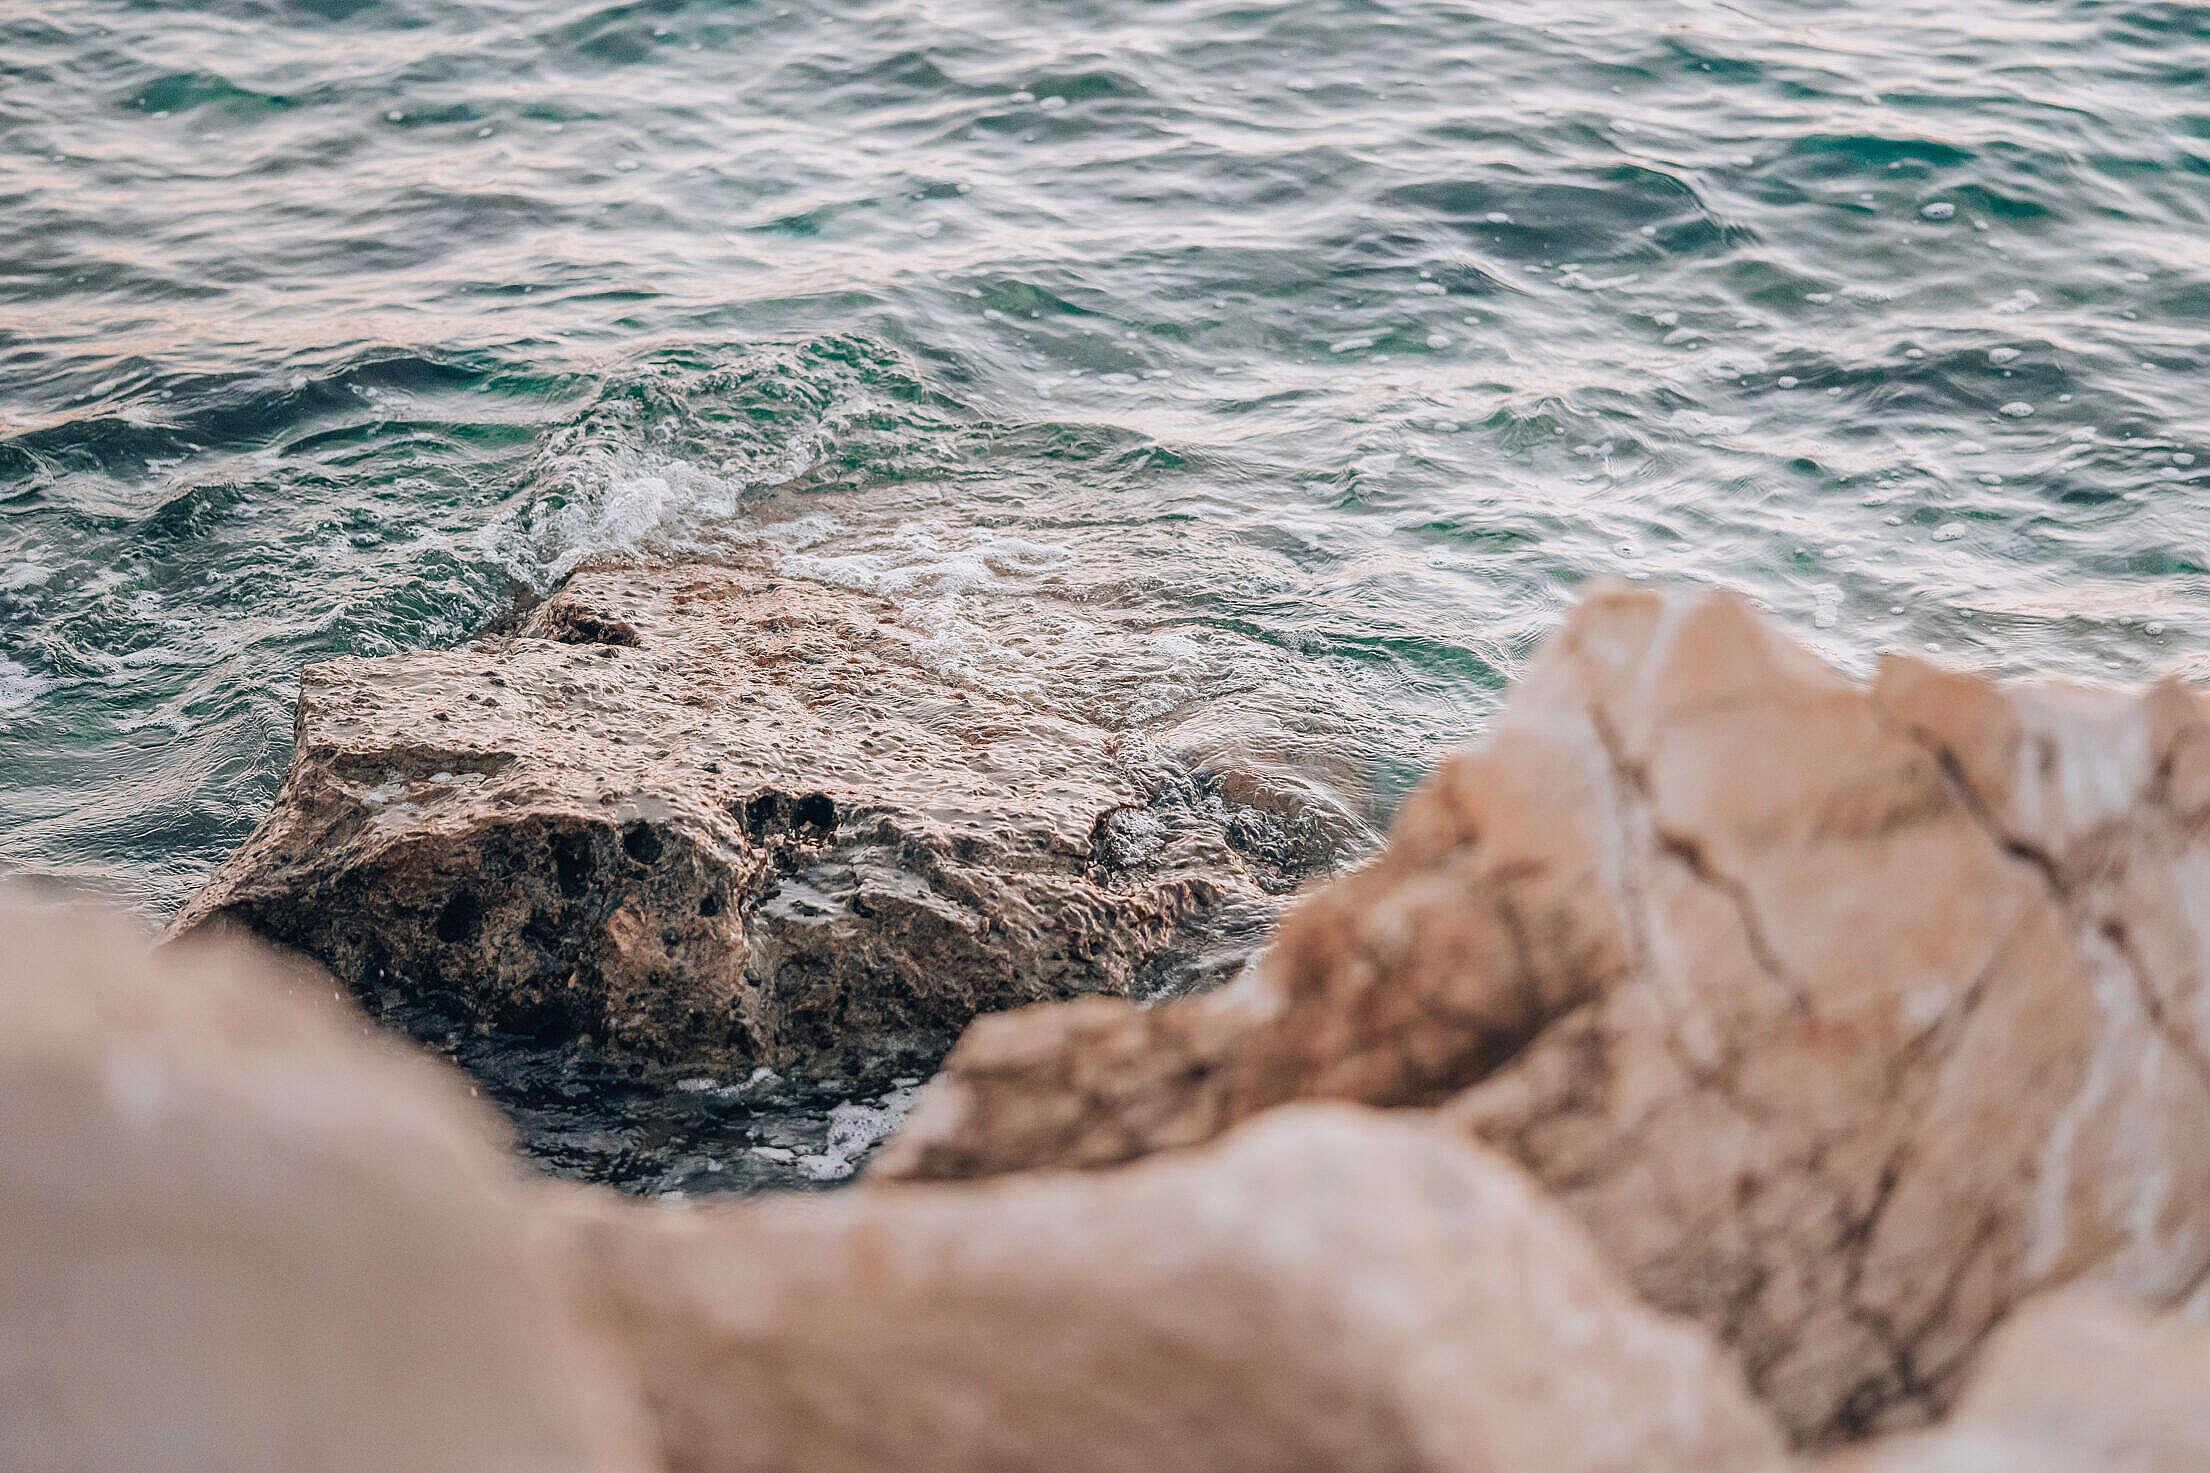 Rocky Shore by the Sea Free Stock Photo